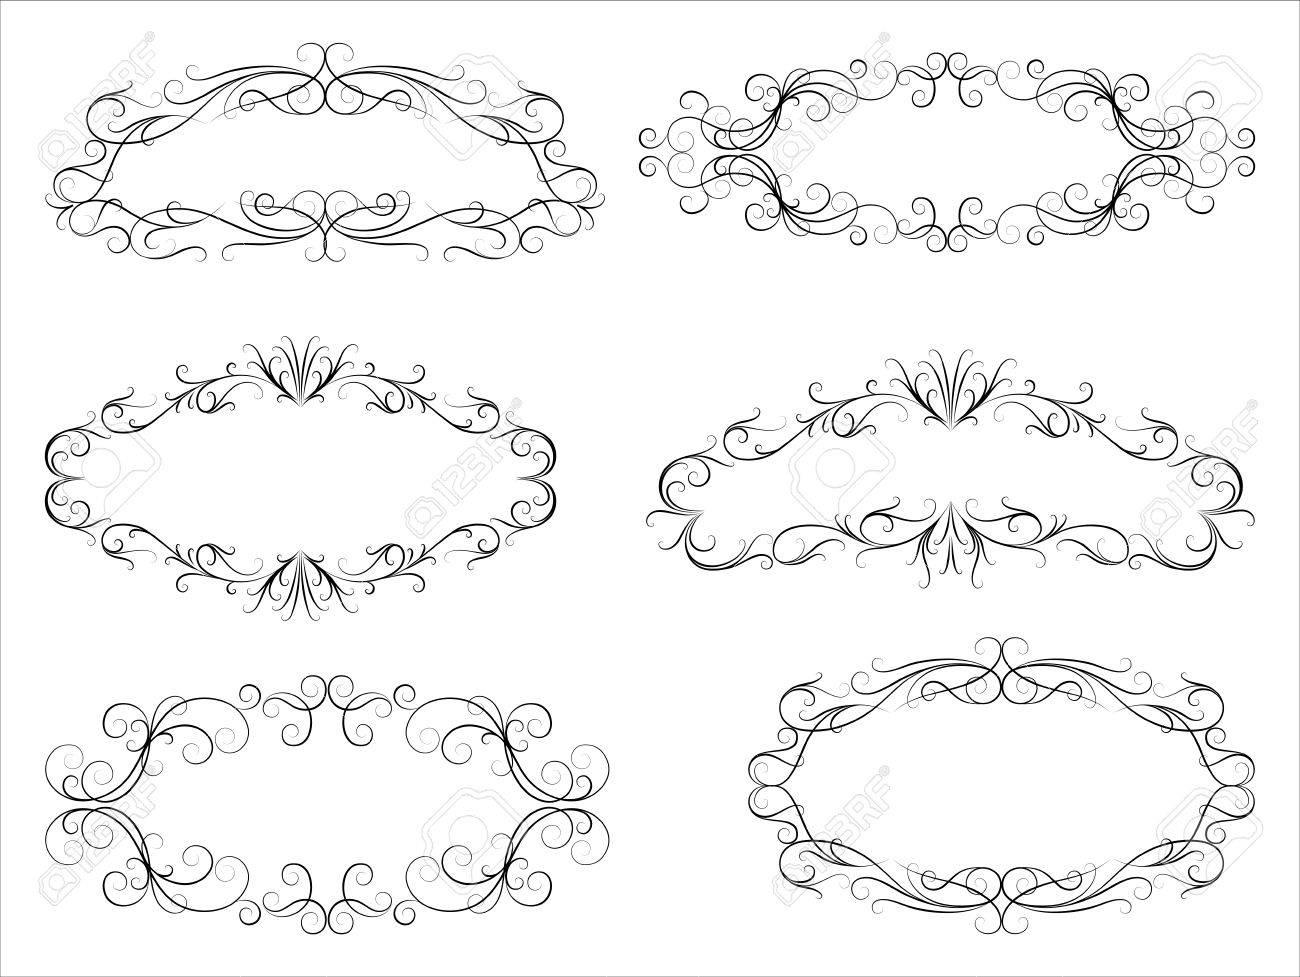 Calligraphic Scroll Frames - Set Of Six Vintage Frames. Each ...